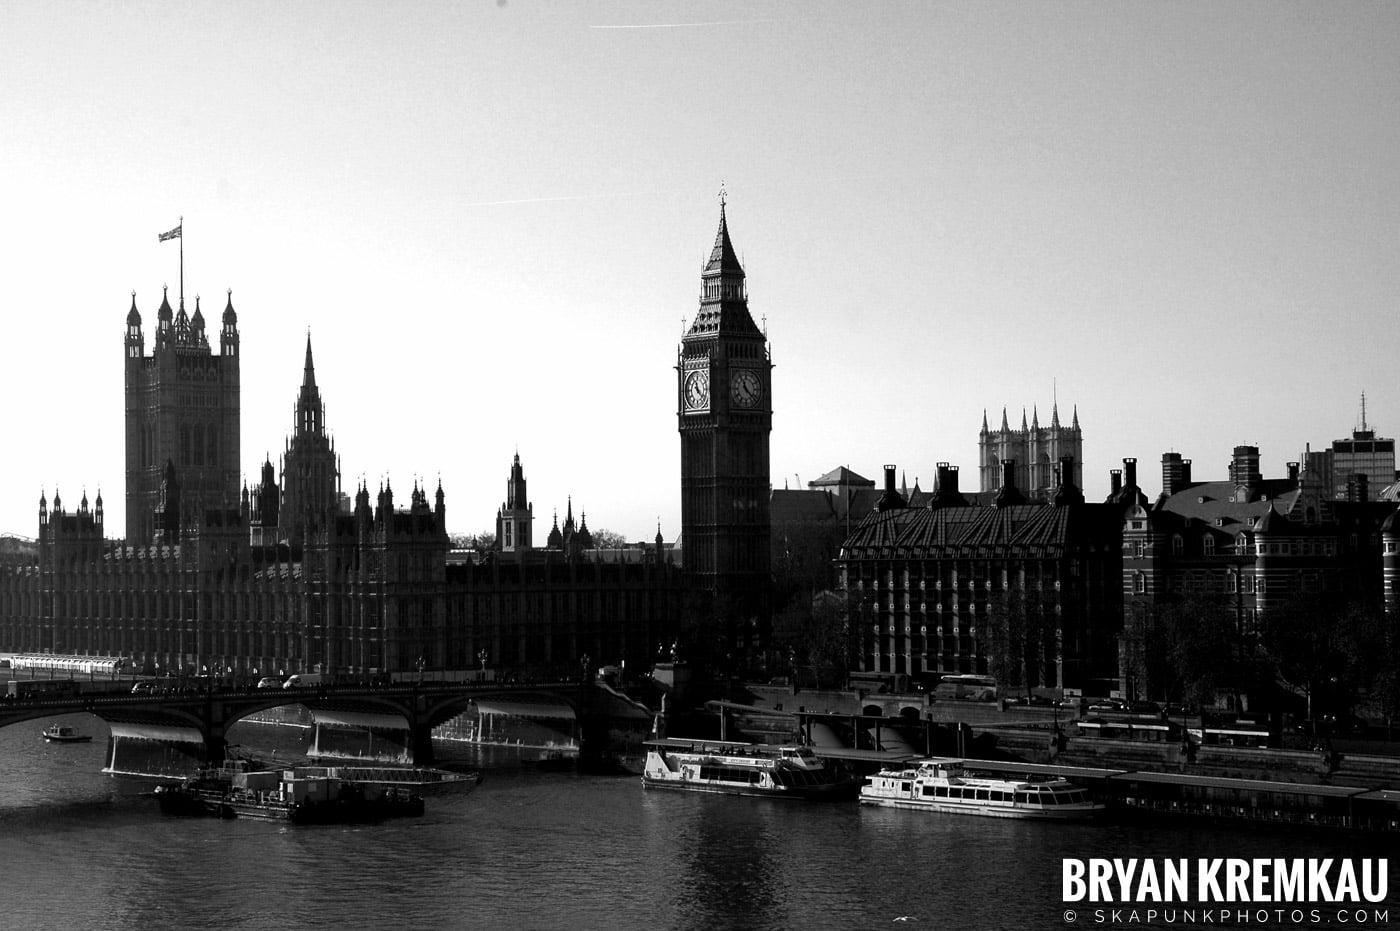 London, England - Day 4 - 12.19.05 (38)